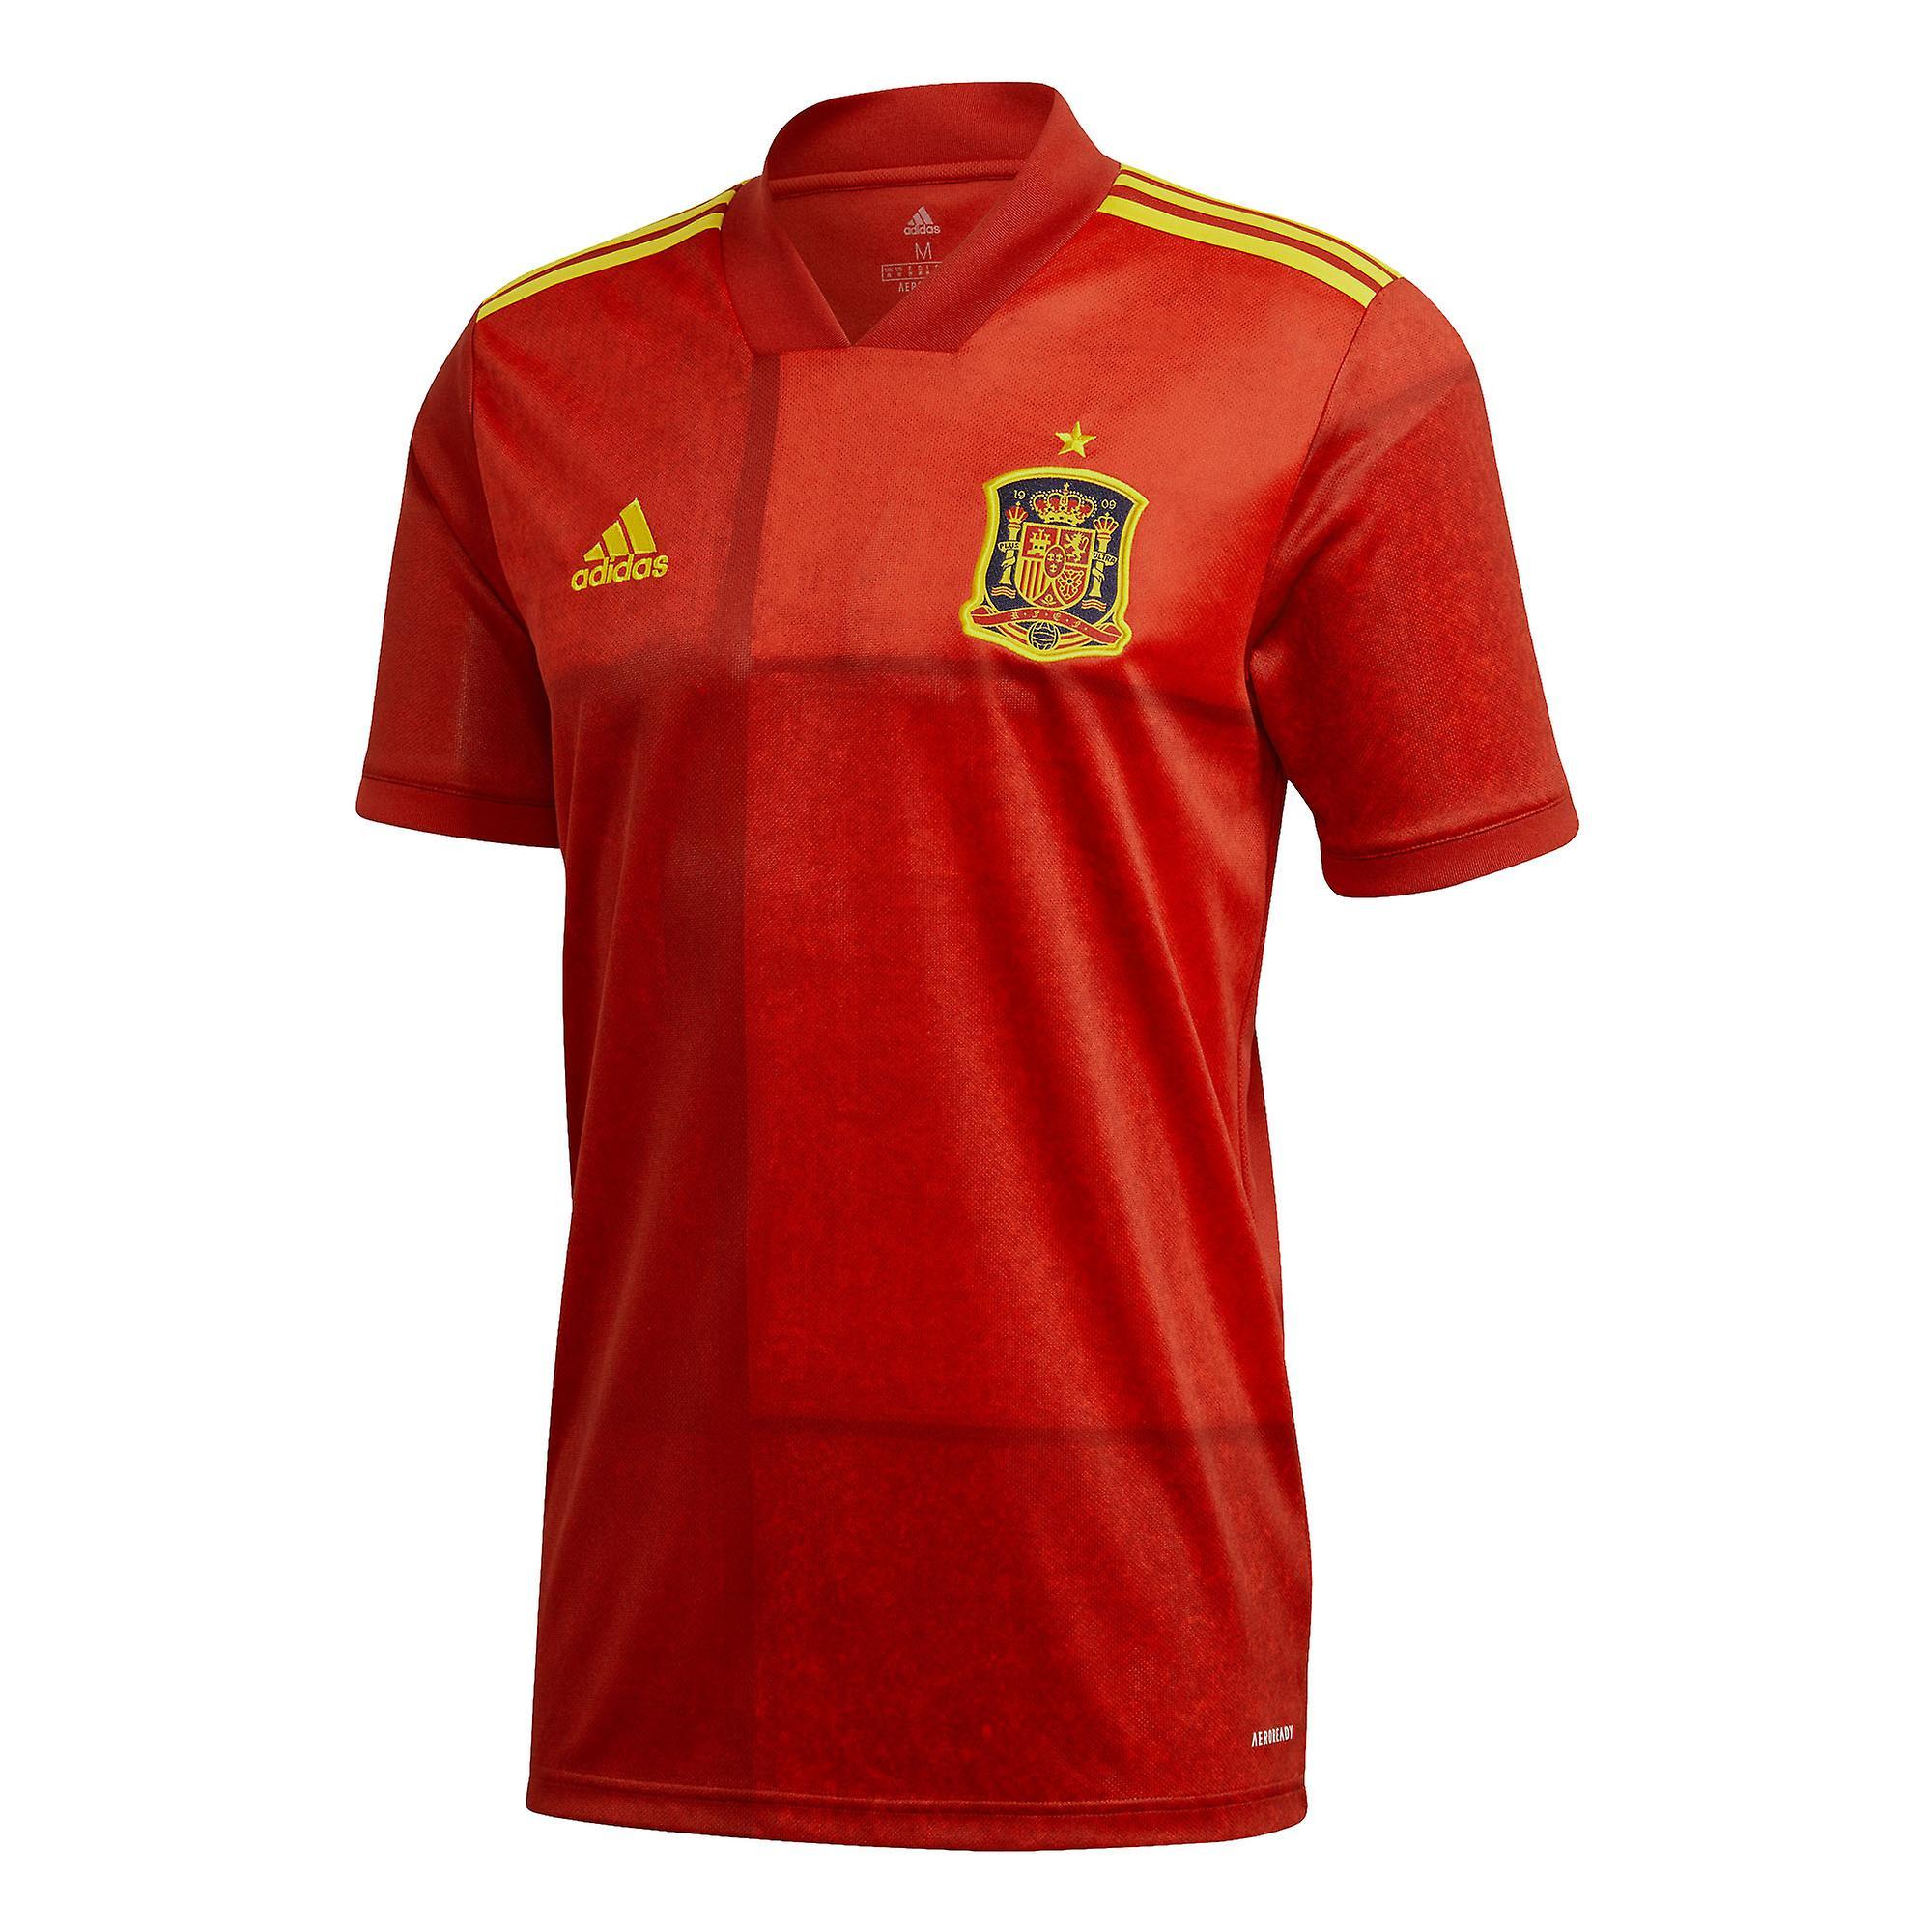 adidas Spain 2020/21 Mens Football Soccer Home Jersey Shirt Tee Red